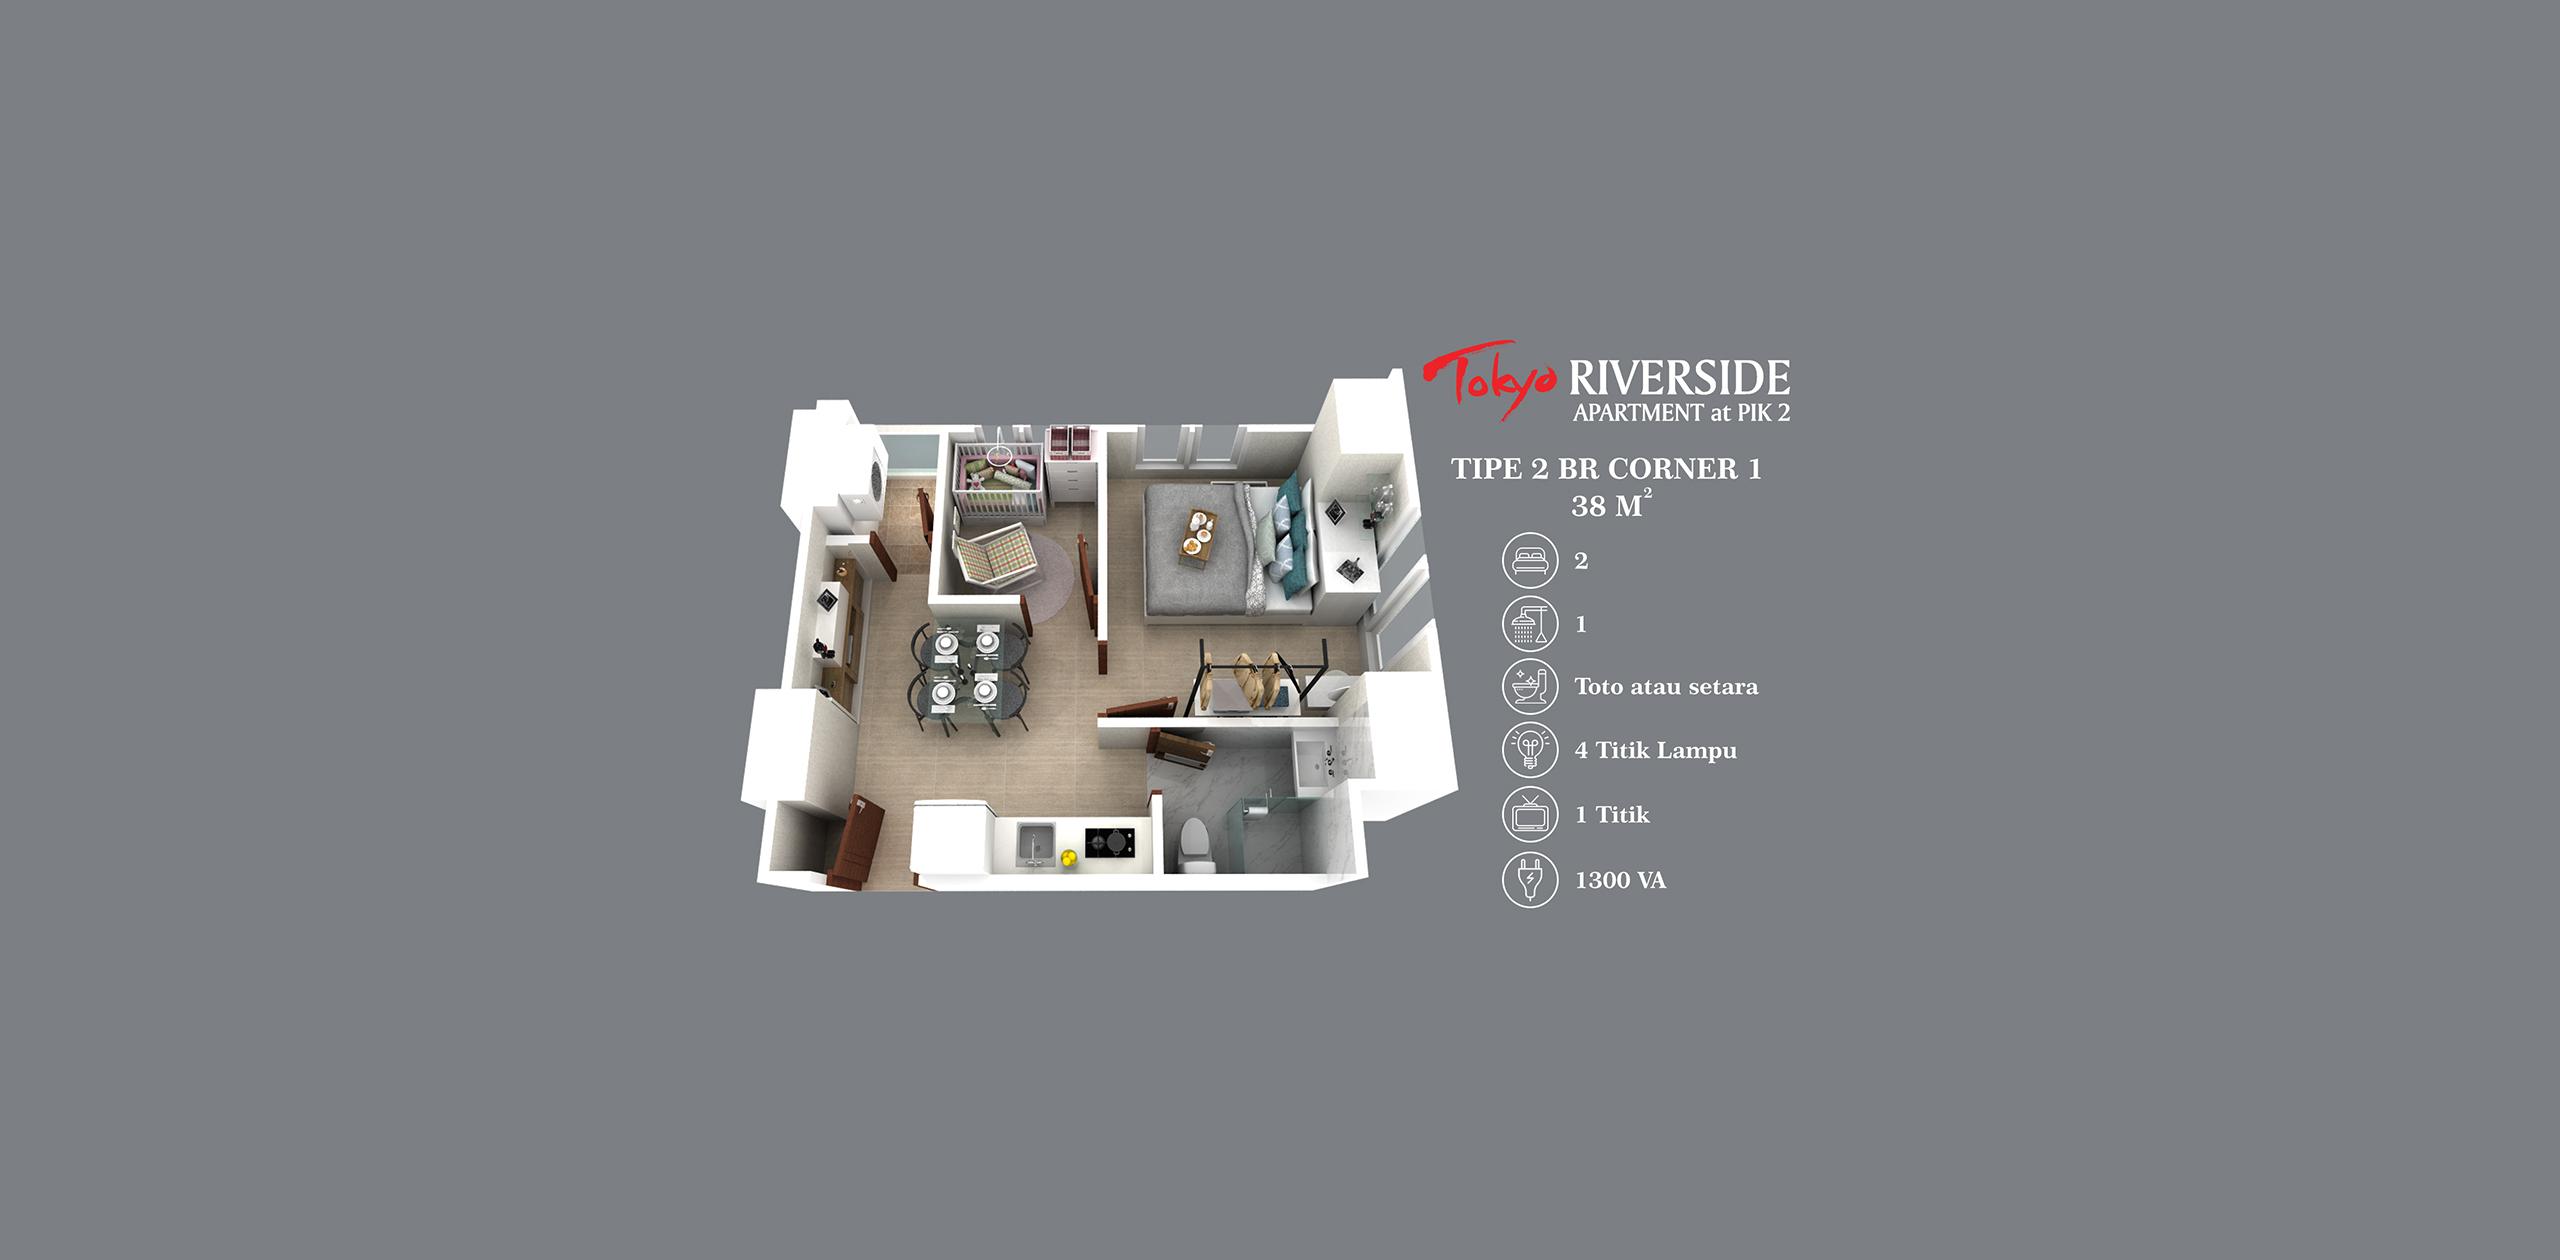 Pik2 - Tokyo Riverside - 2BR Corner 1